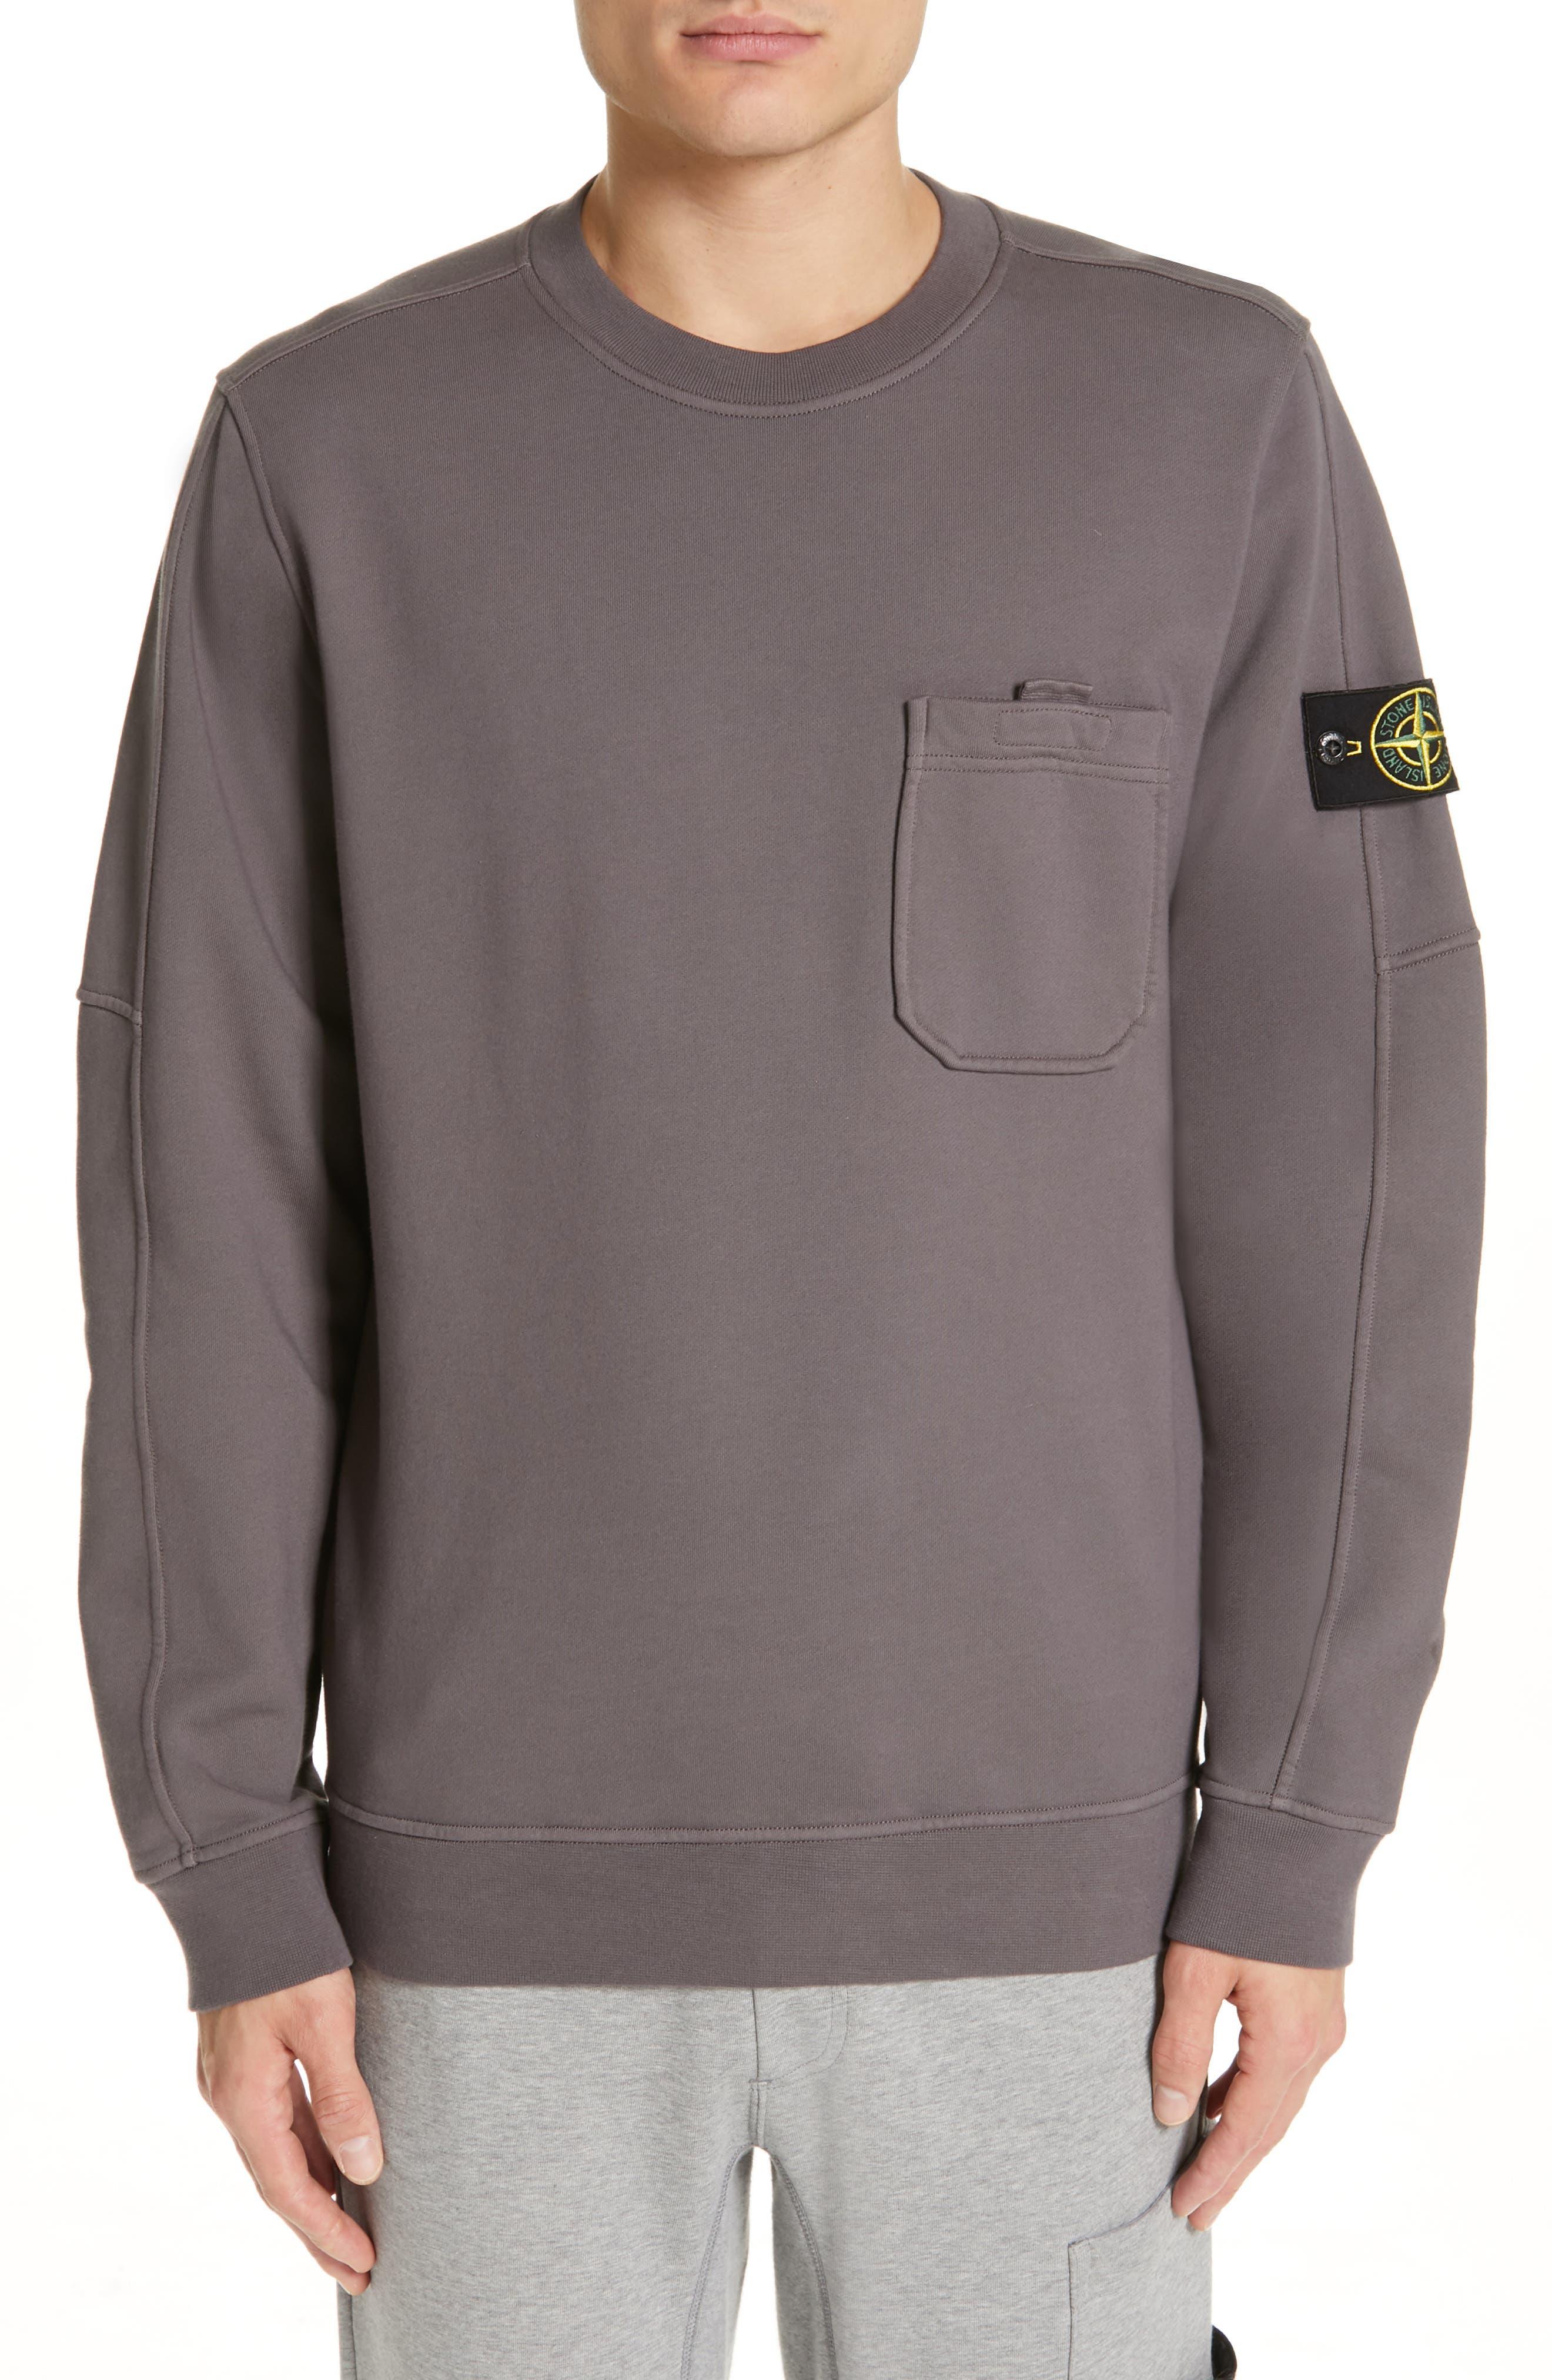 STONE ISLAND Pocket Sweatshirt, Main, color, BLUE